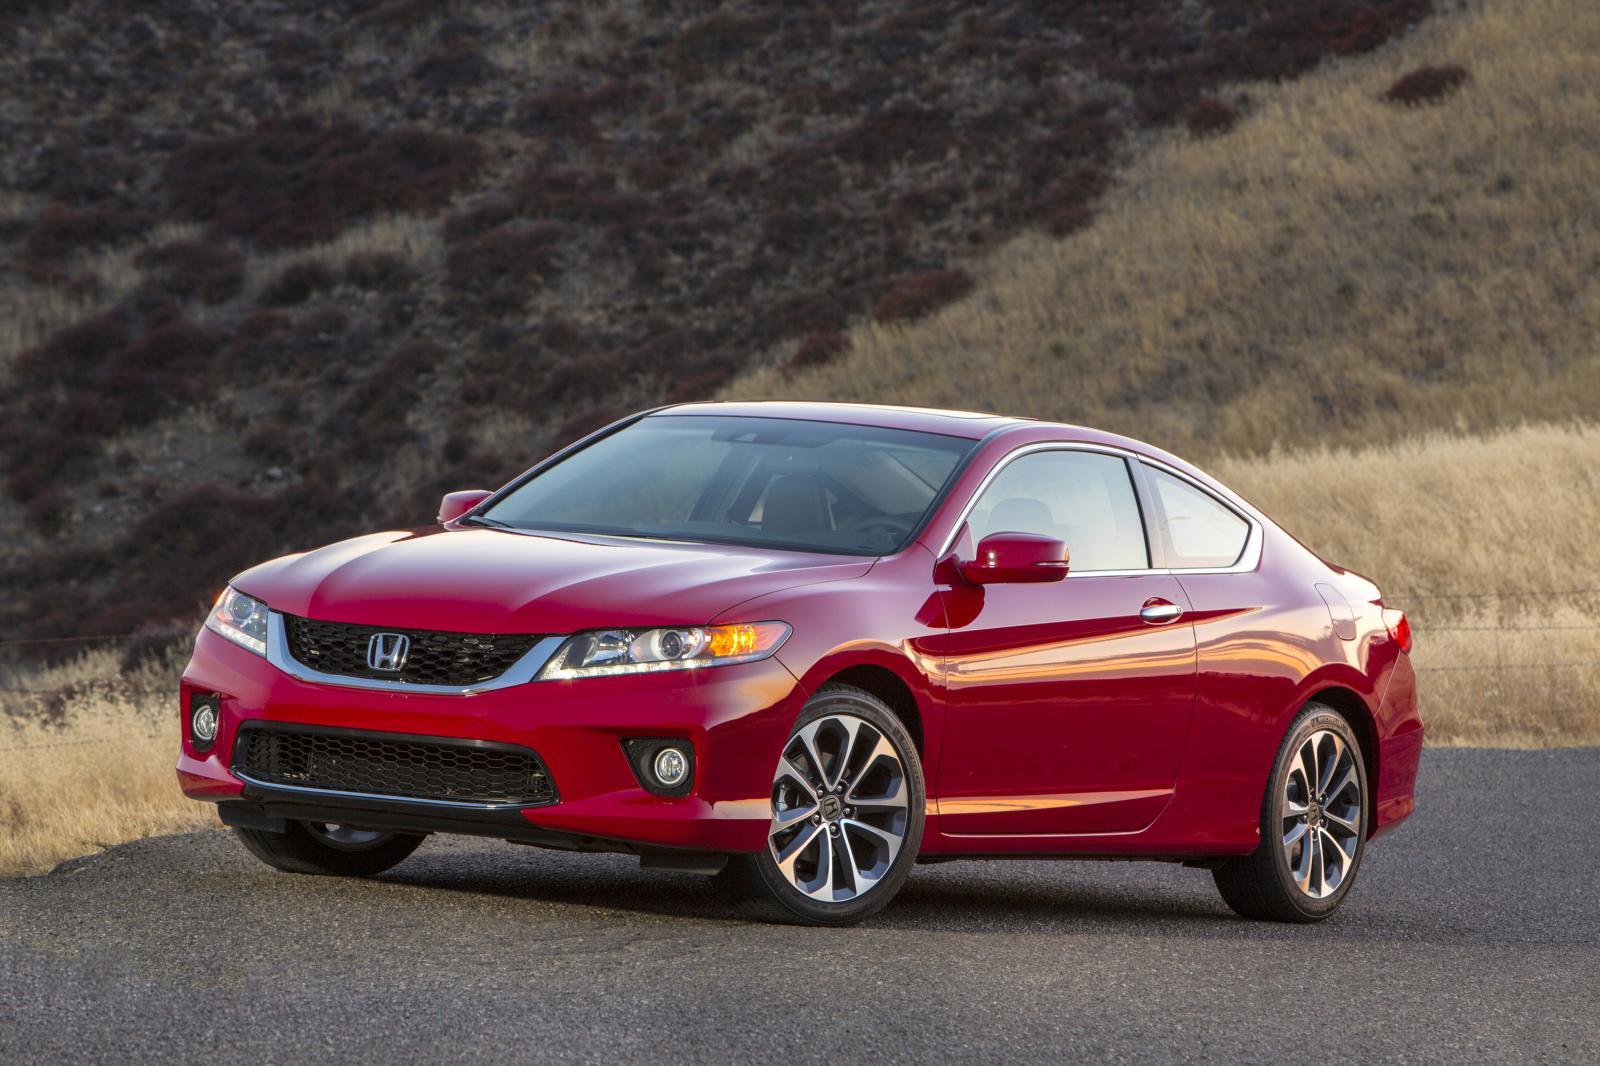 Marvelous ... 2014 Honda Accord ...